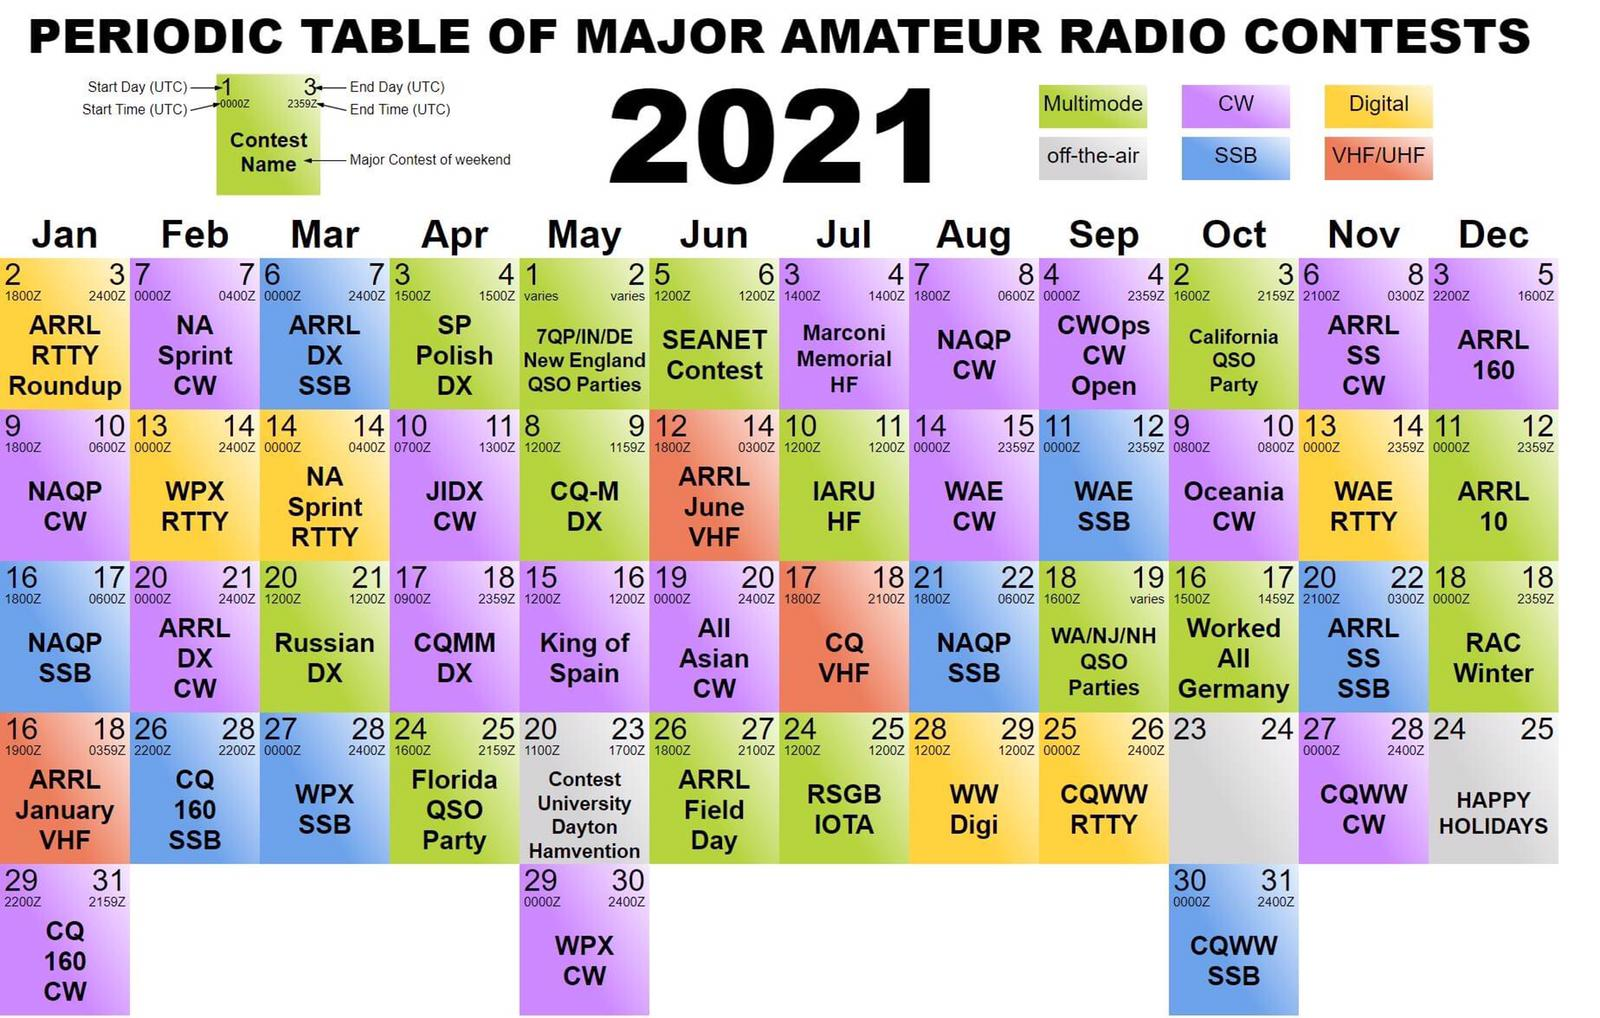 Periodic Table of Major Amateur Radio Contests